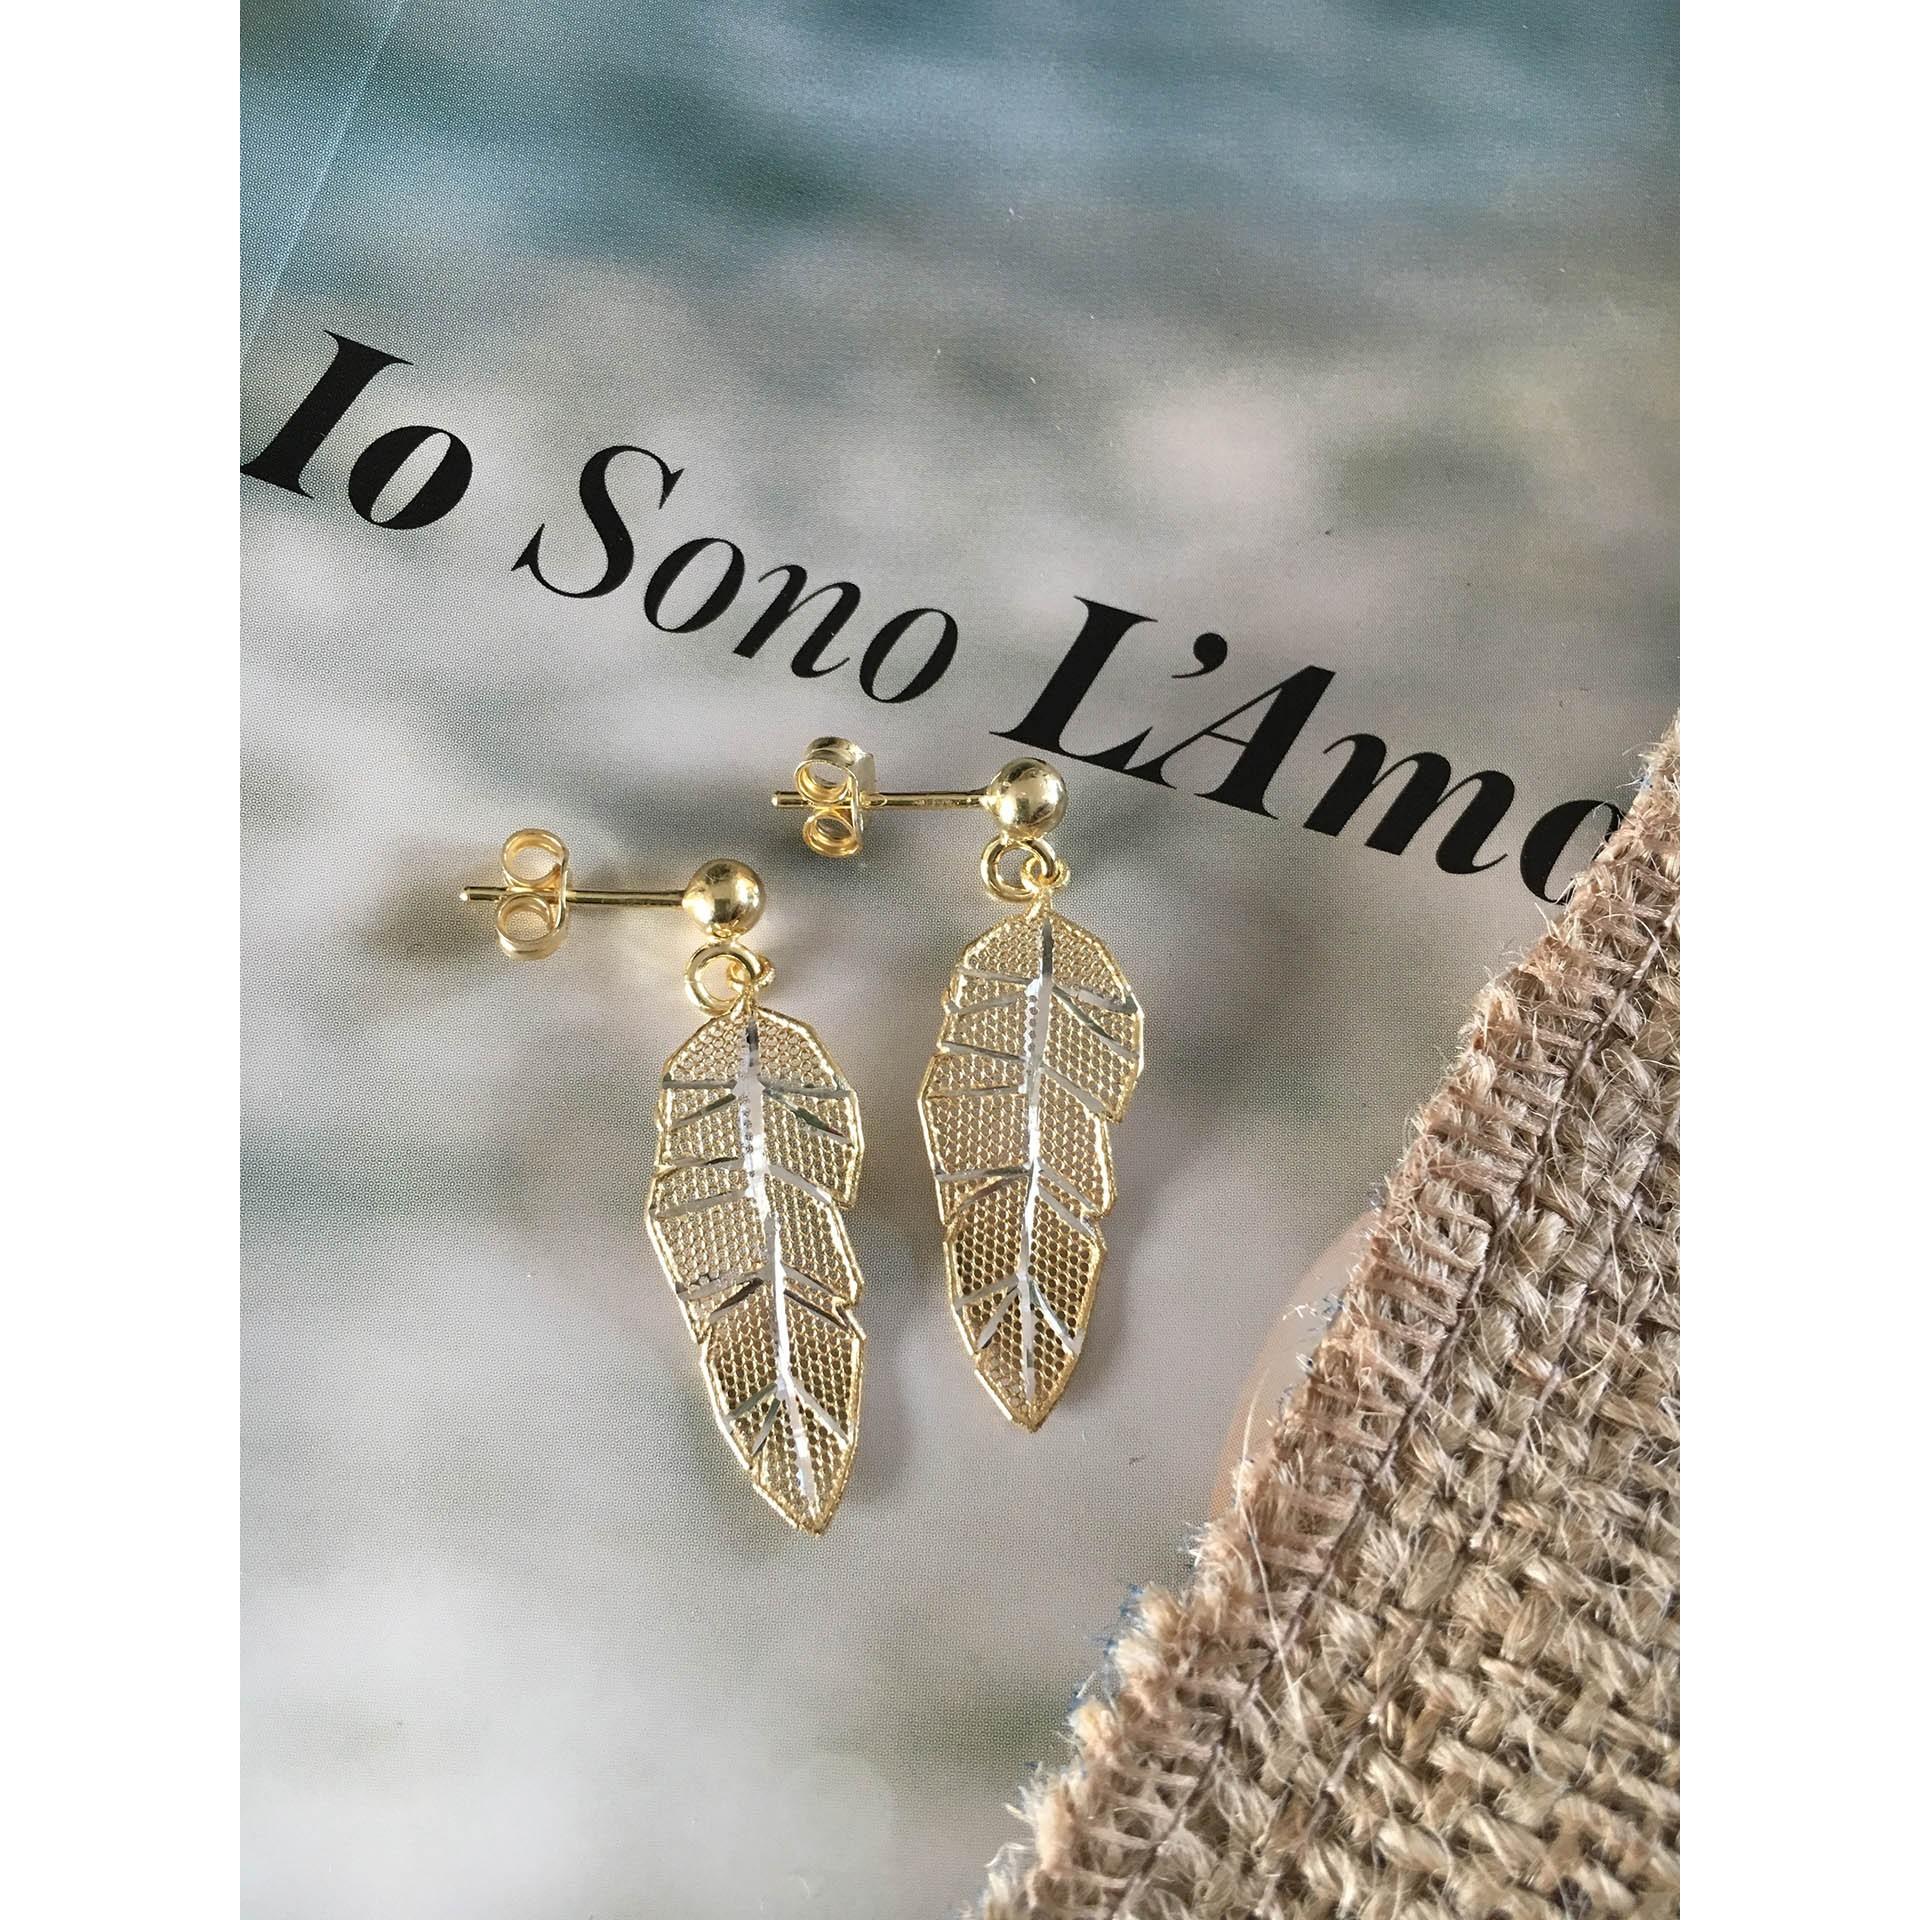 The Leaves in Gold mini silver earrings